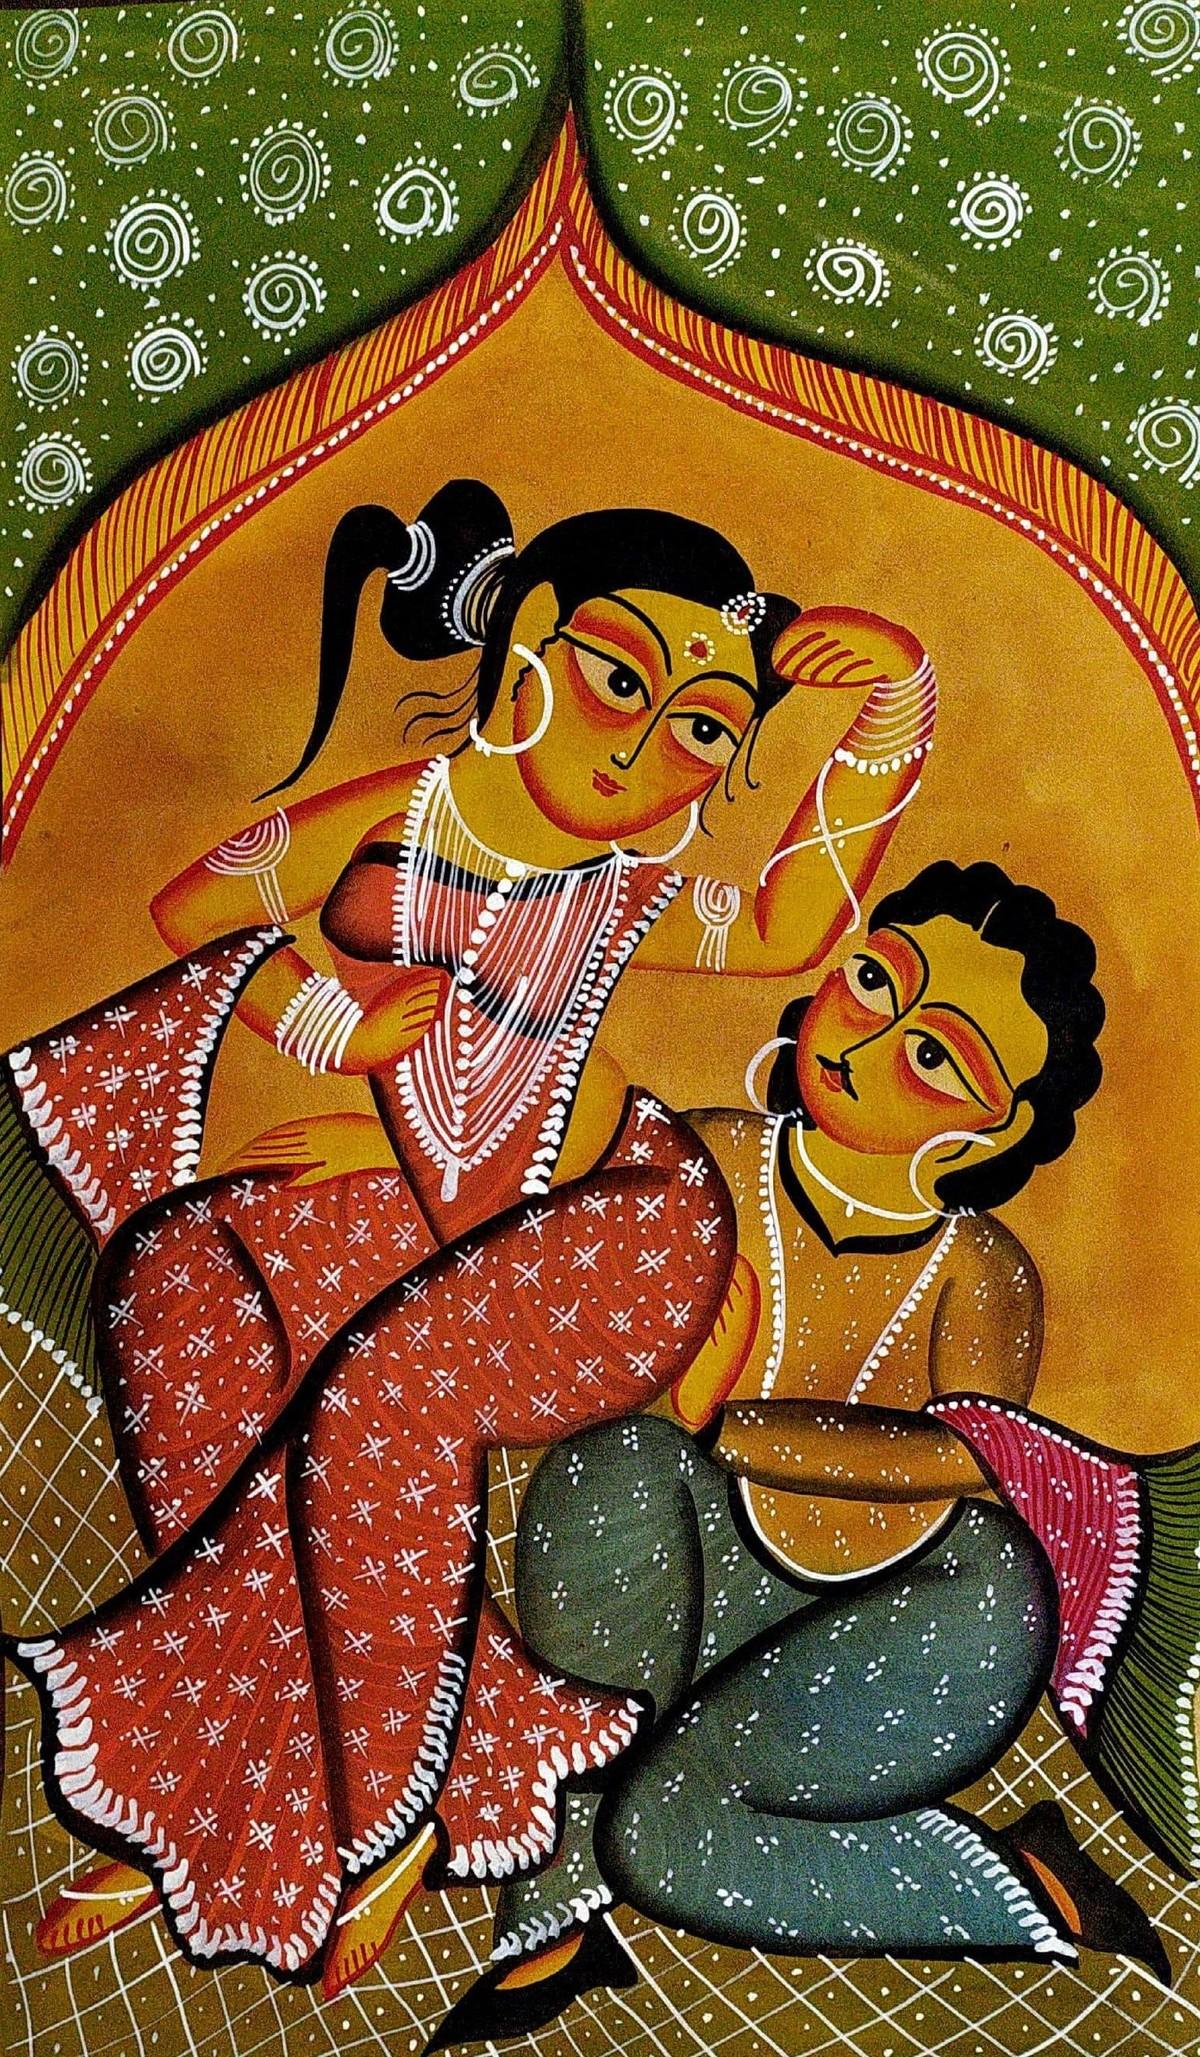 Babu & Bibi - Intimate Moments by Swarna Chitrakar, Folk Painting, Natural colours on paper, Brown color